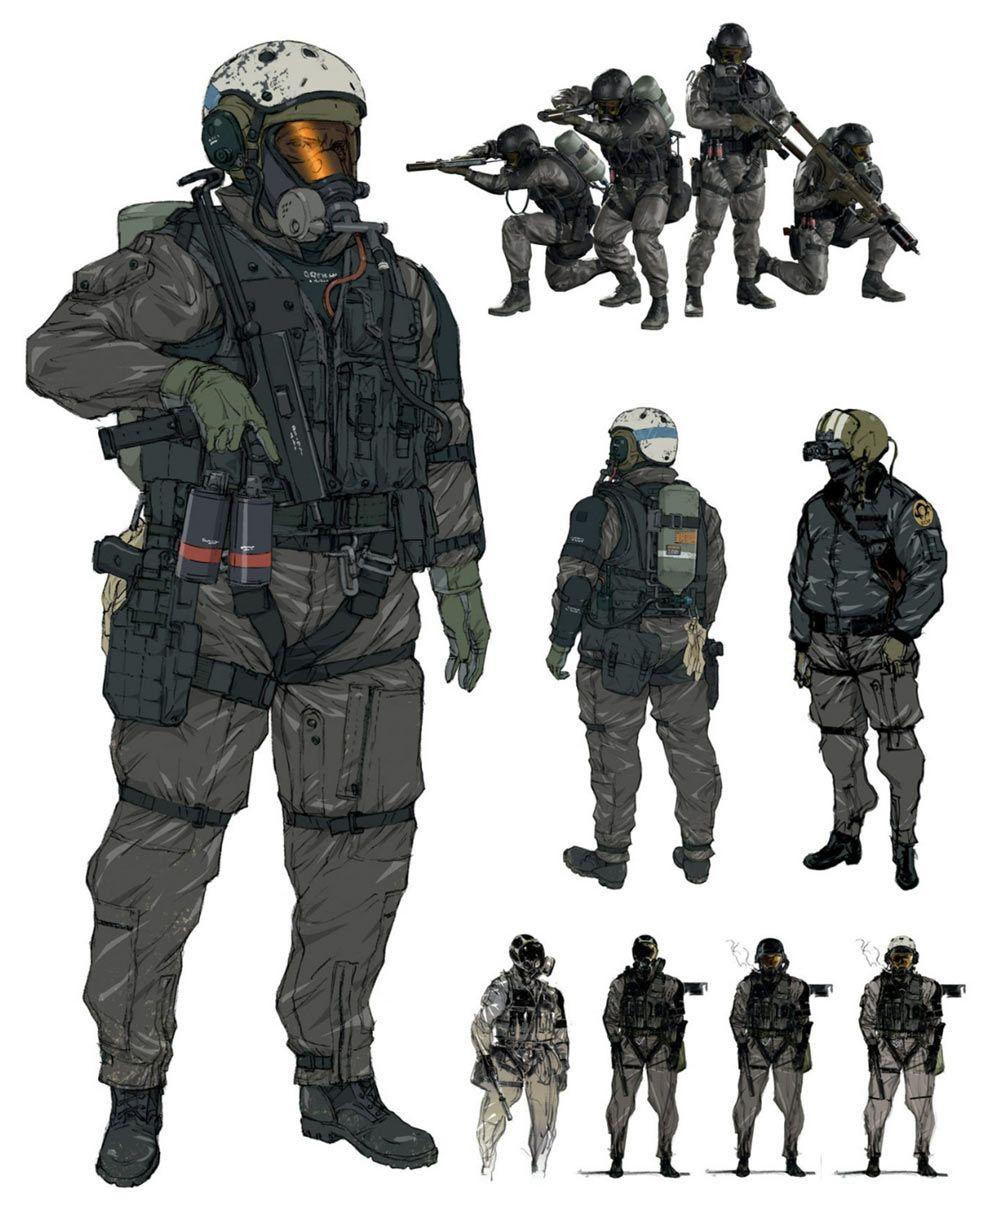 Metal Gear Solid V: Ground Zeroes Review | bit-tech.net